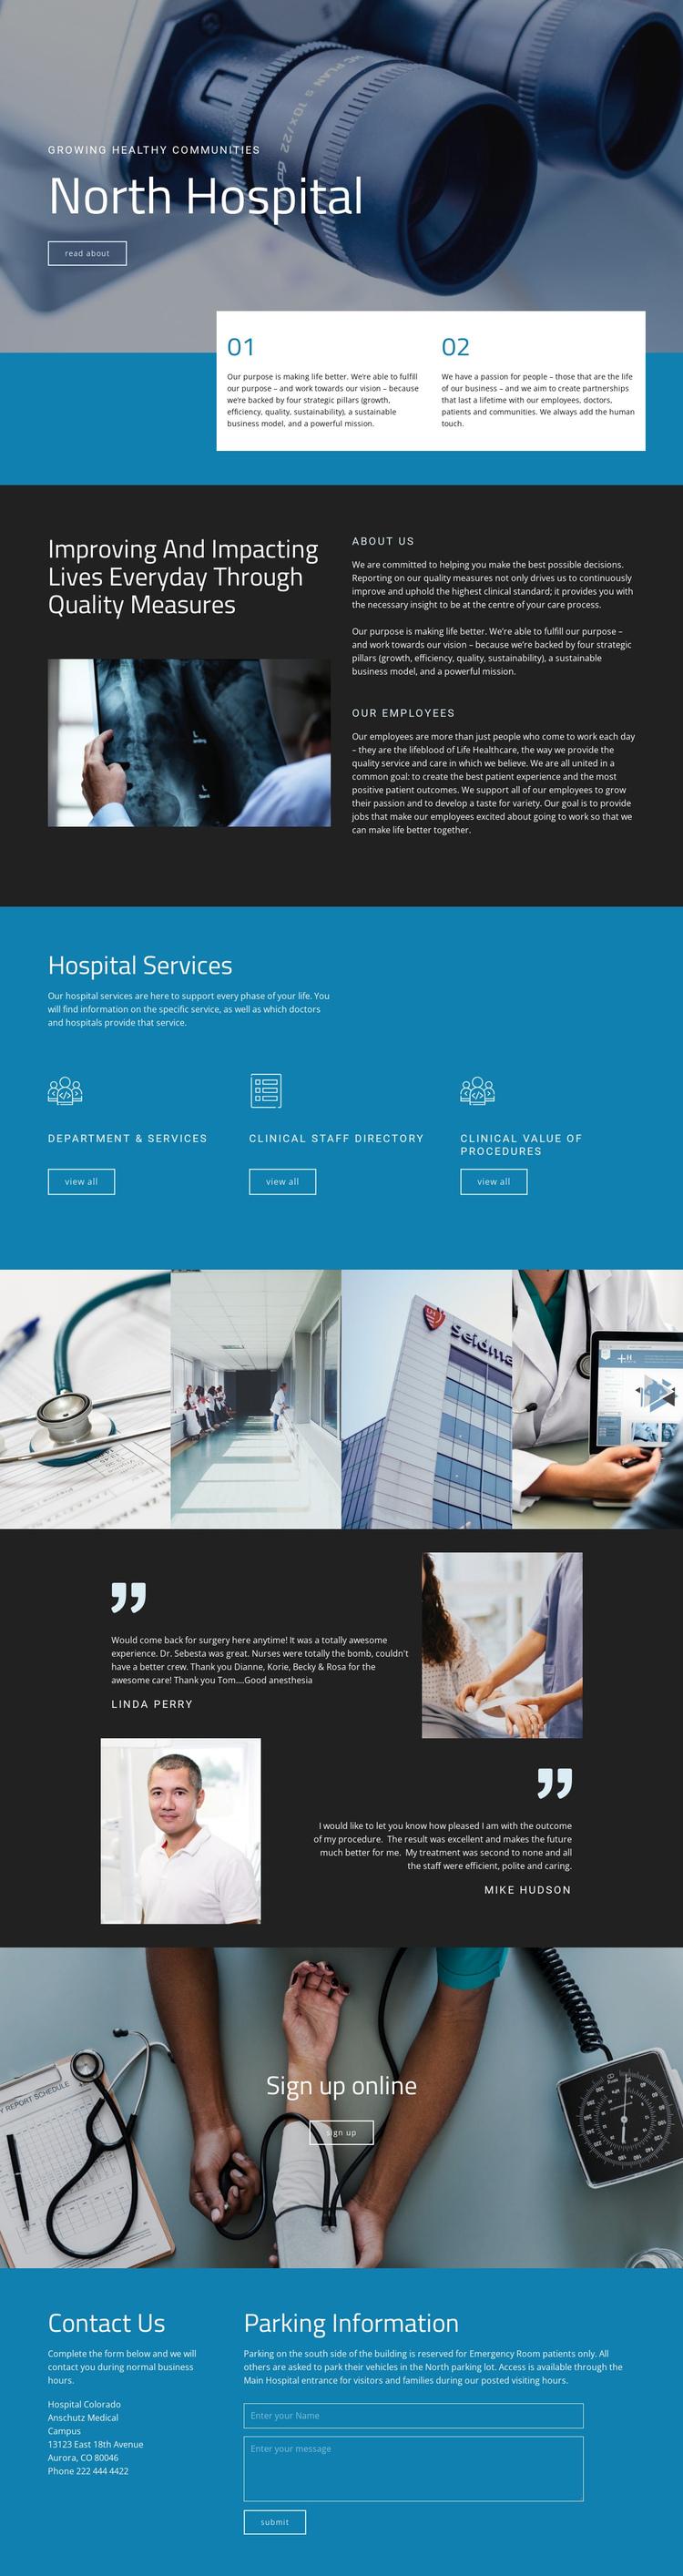 Impacting lives with medicine Website Builder Software